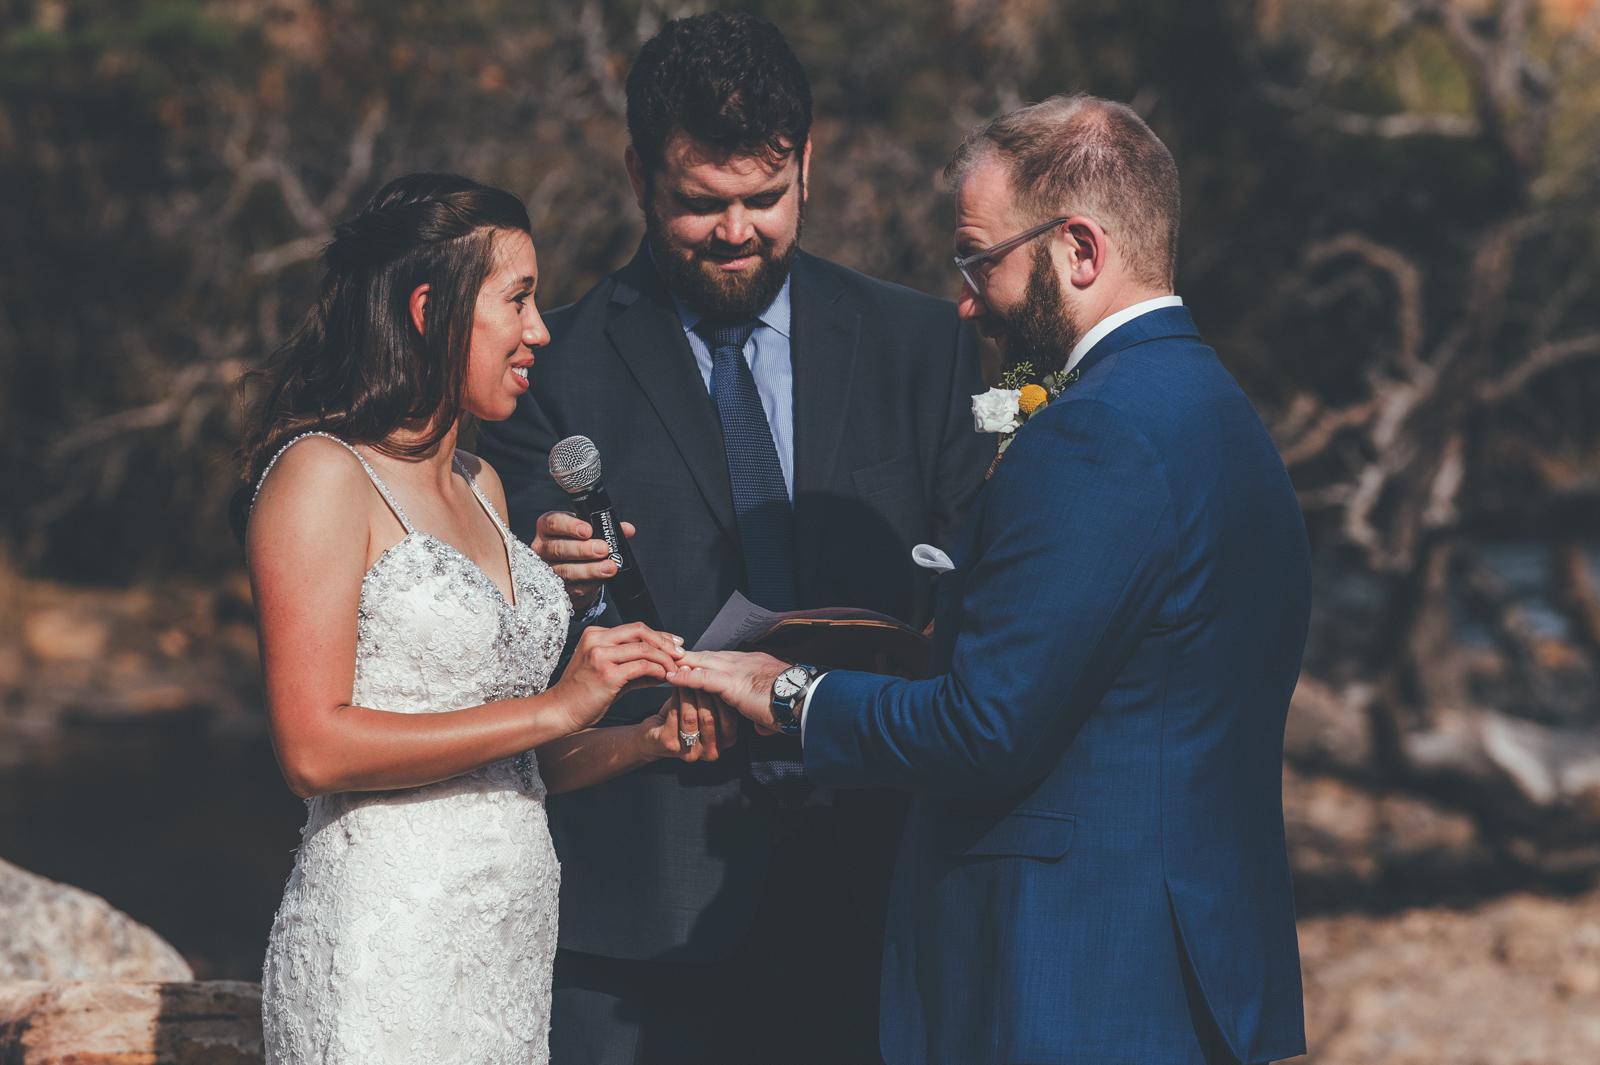 ChadFahnestockPhotography-estes-park-wedding-photography-023.jpg